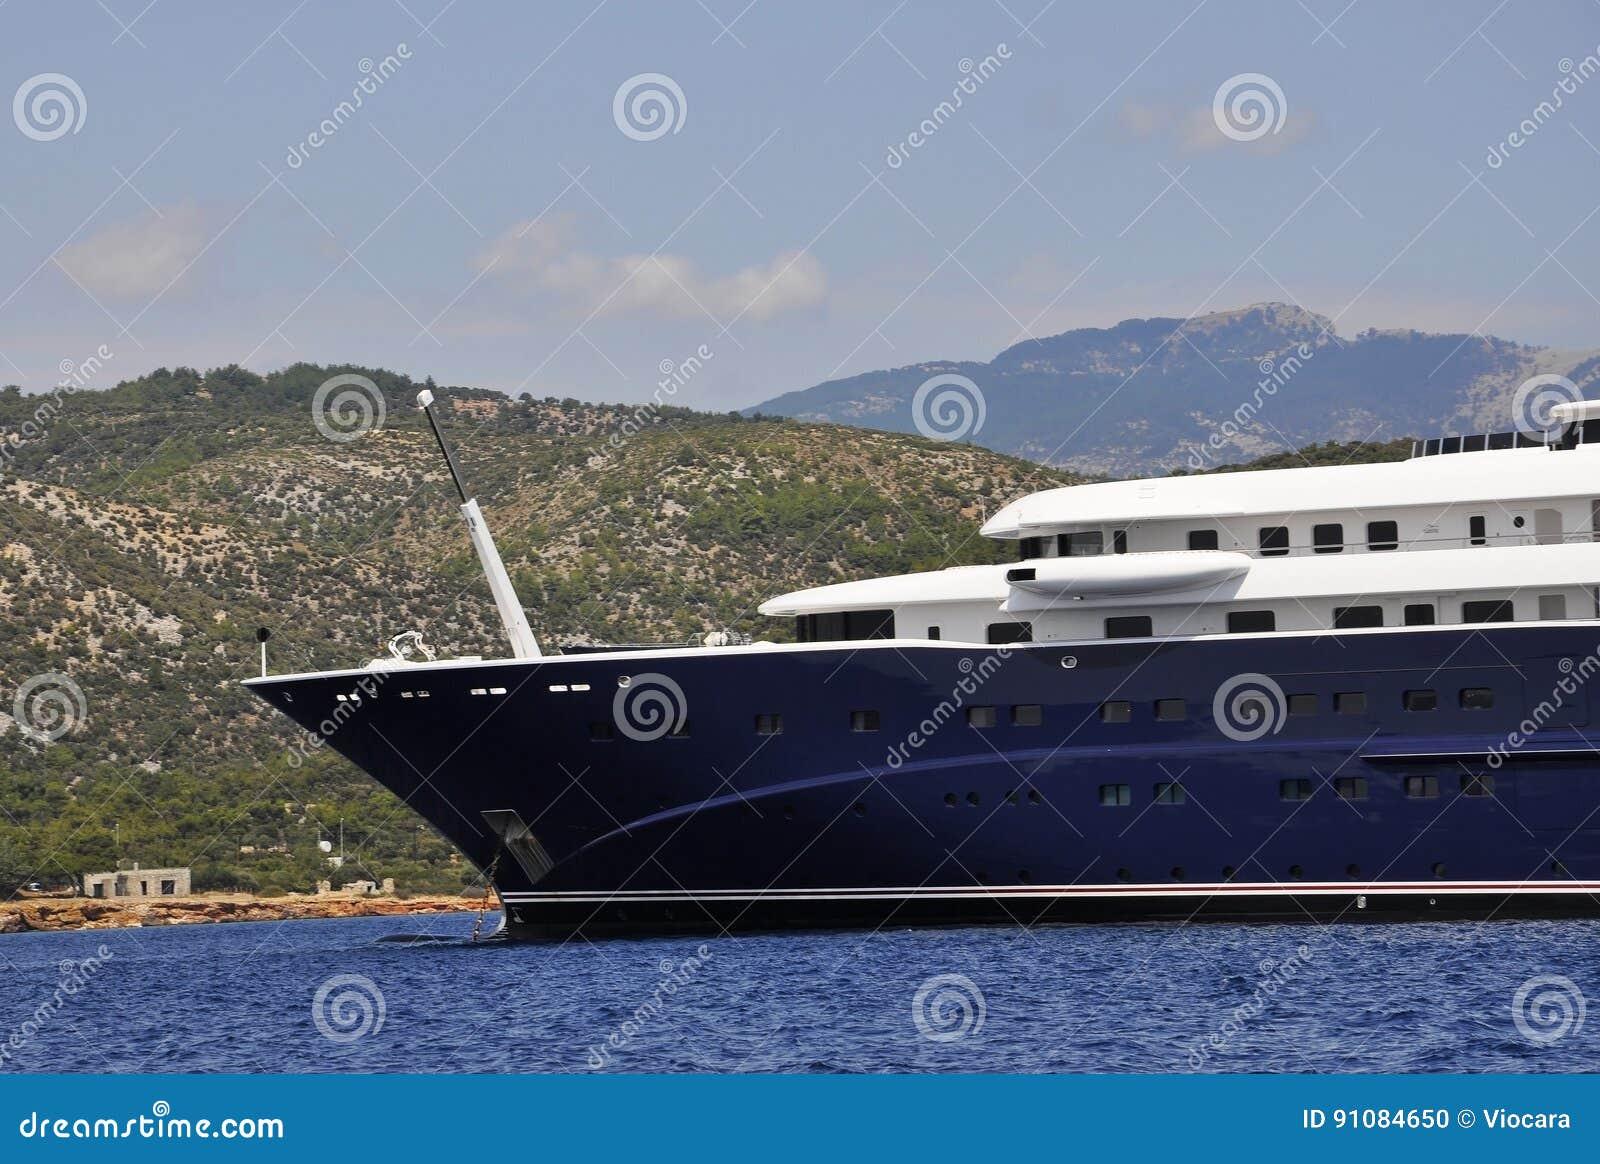 Thassos, August 21st: Cruise Ship on the Aegean Sea near Thassos island in Greece